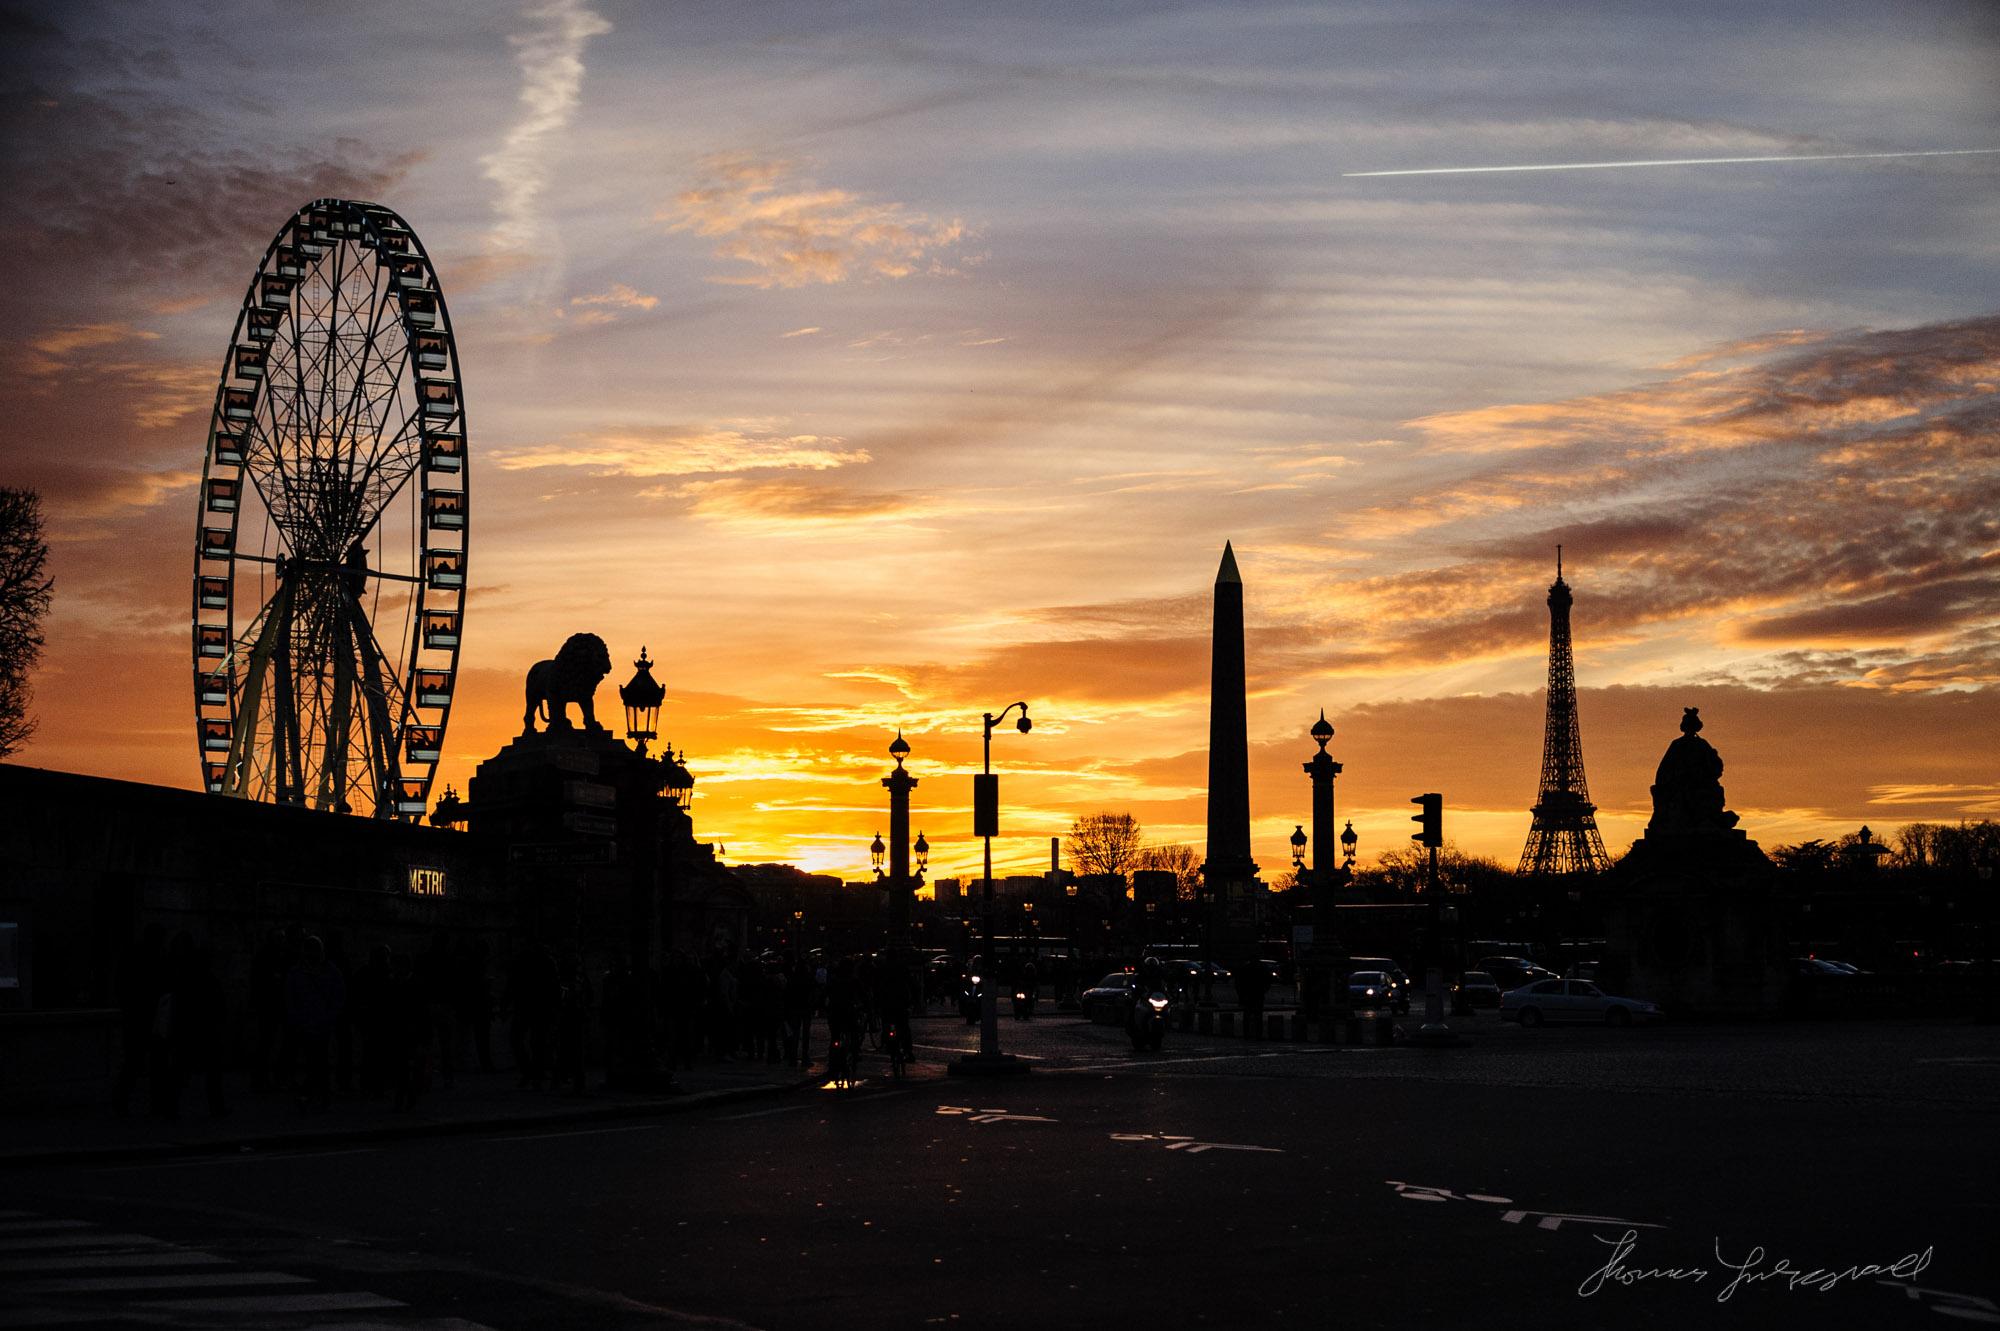 Sunset over Place de Concorde in Paris on the Winter Solstice 20